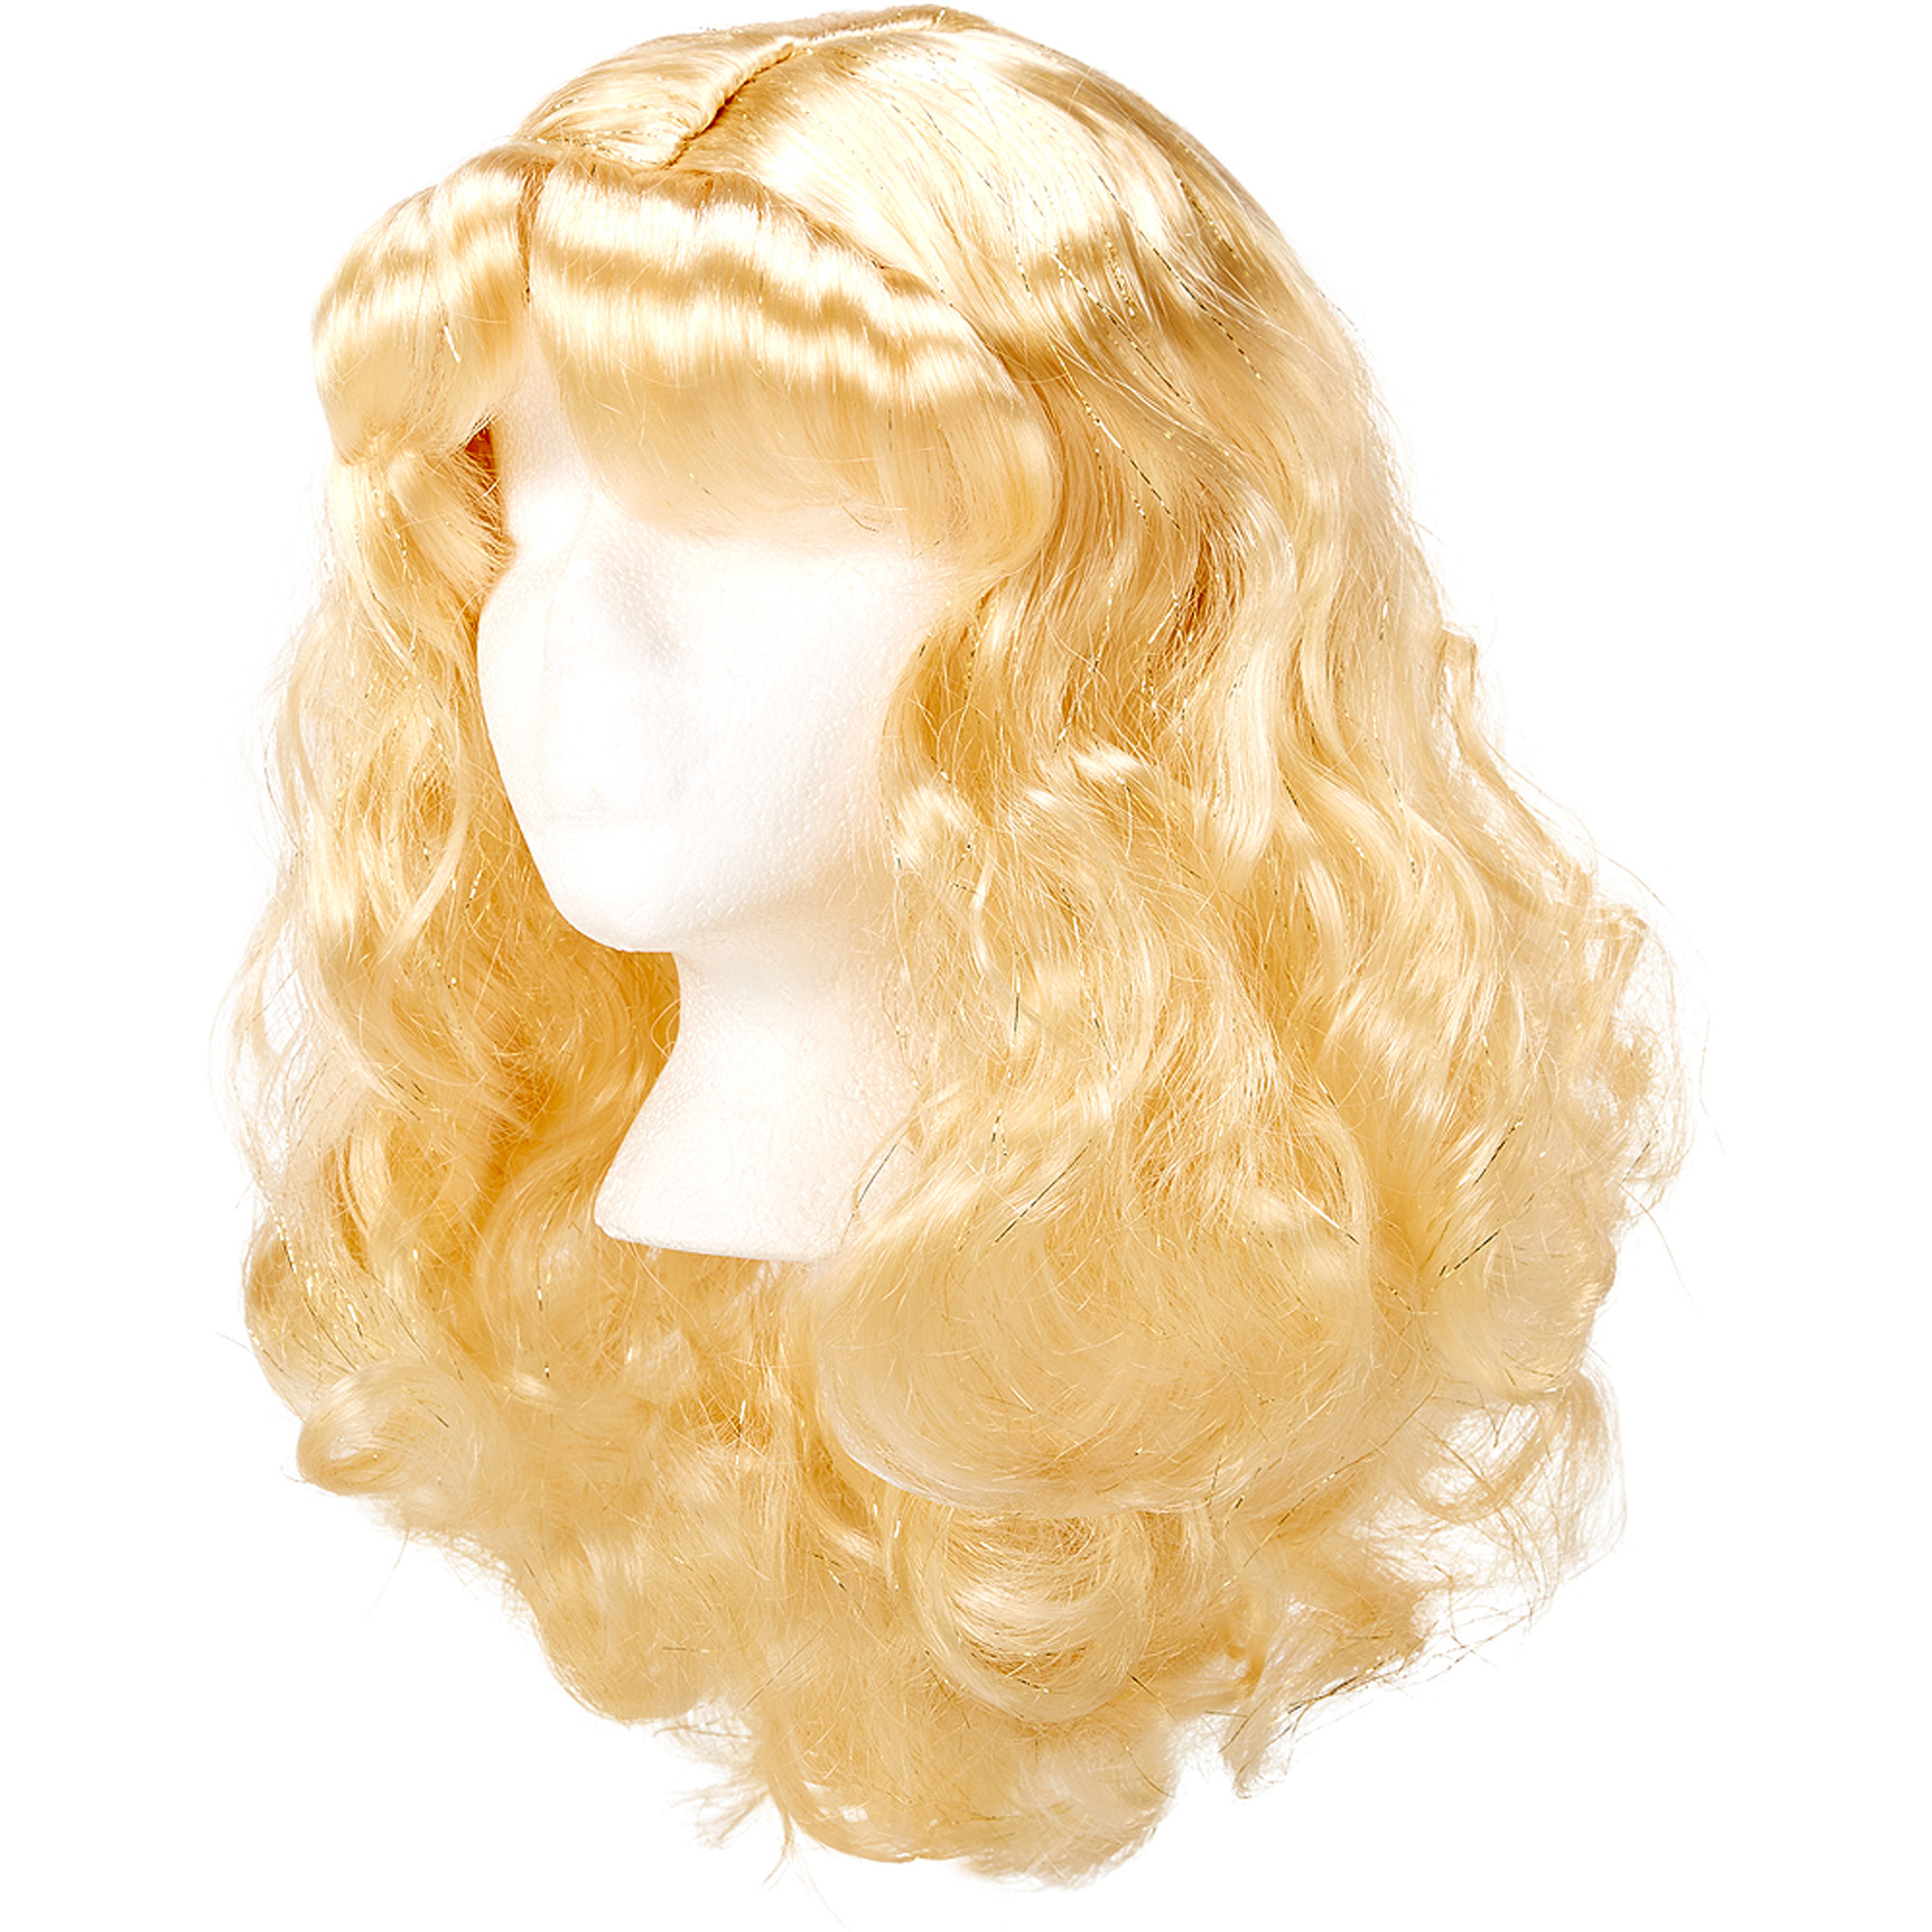 Disney Princess Sleeping Beauty Wig by Jakks